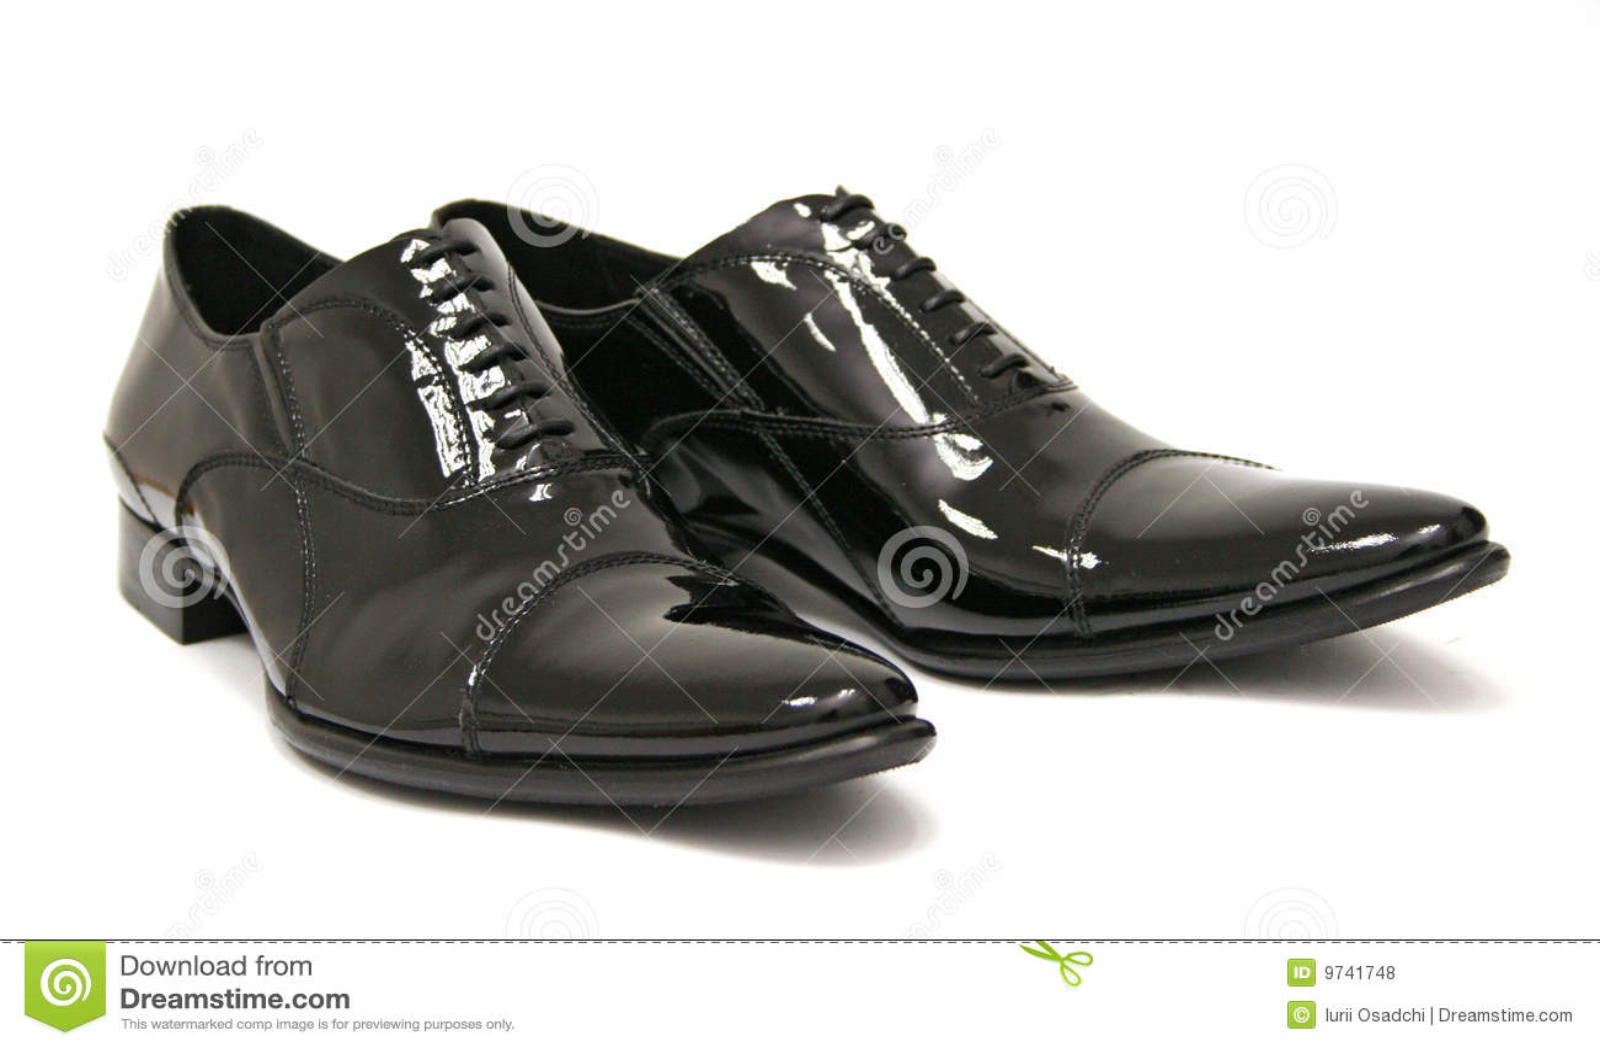 Shiny Black Men Shoes Royalty Free Stock Photos - Image: 9741748